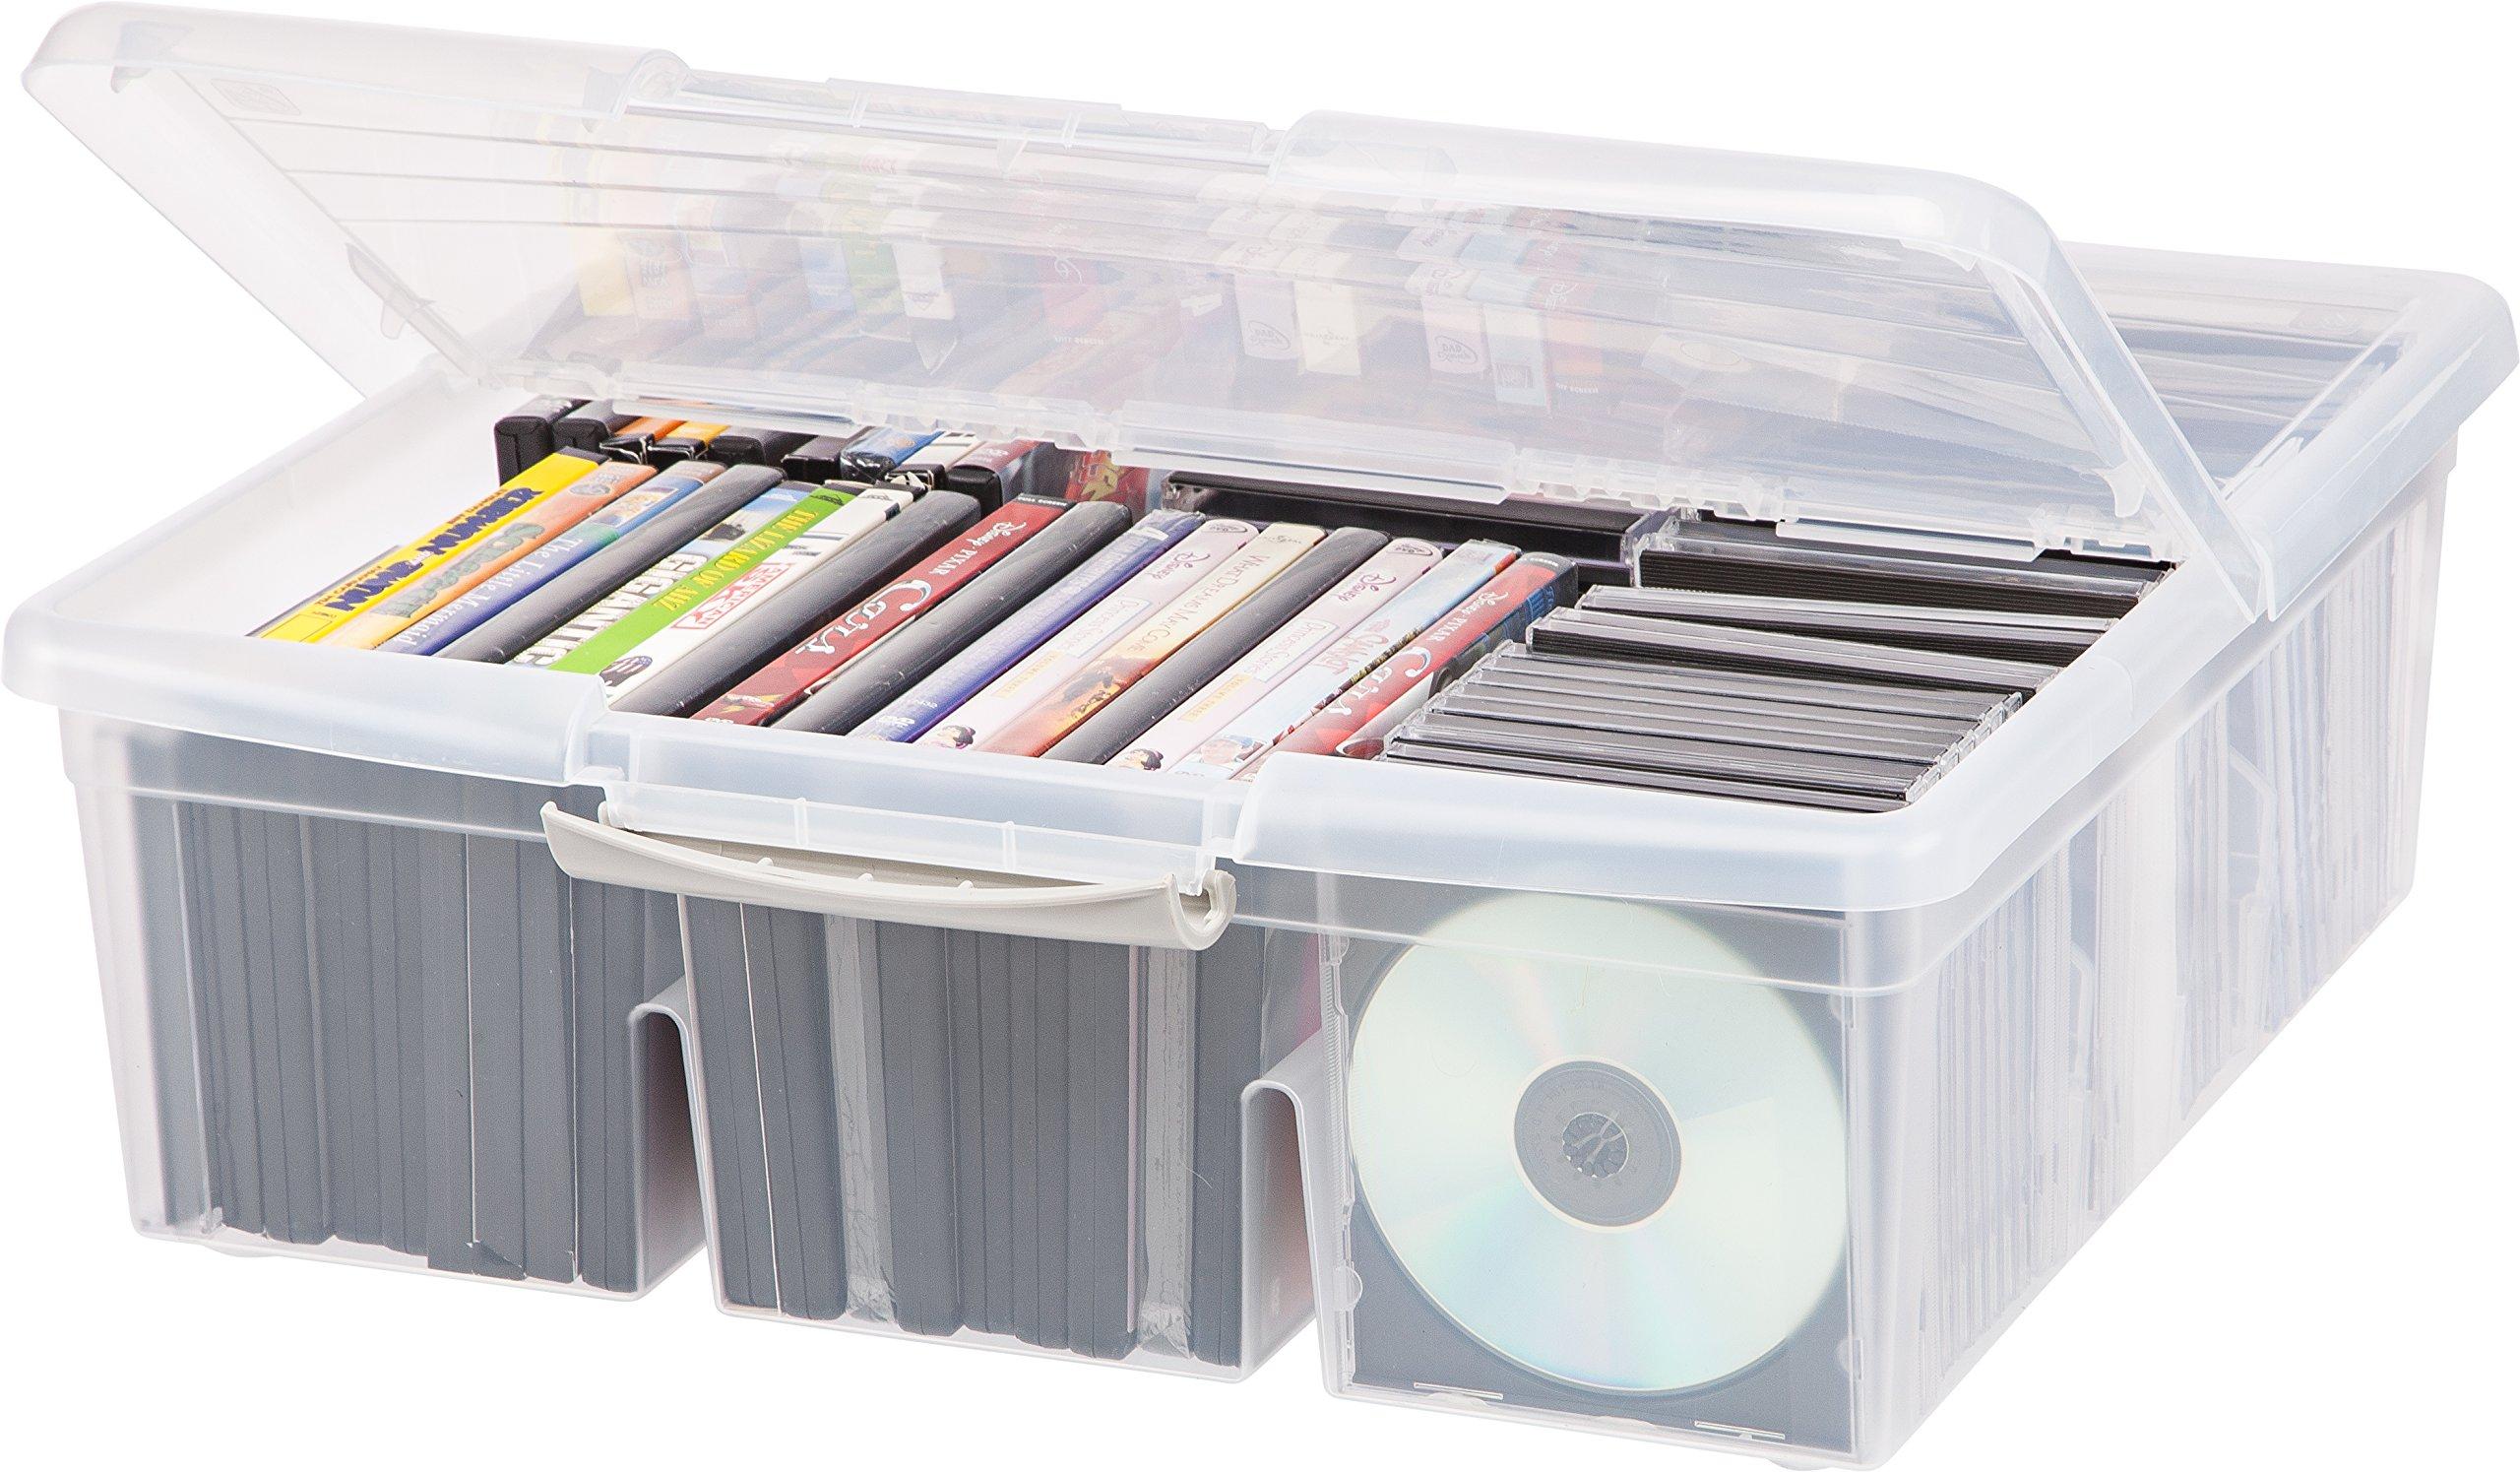 IRIS Large Divided Media Storage Box, Clear by IRIS USA, Inc. (Image #5)